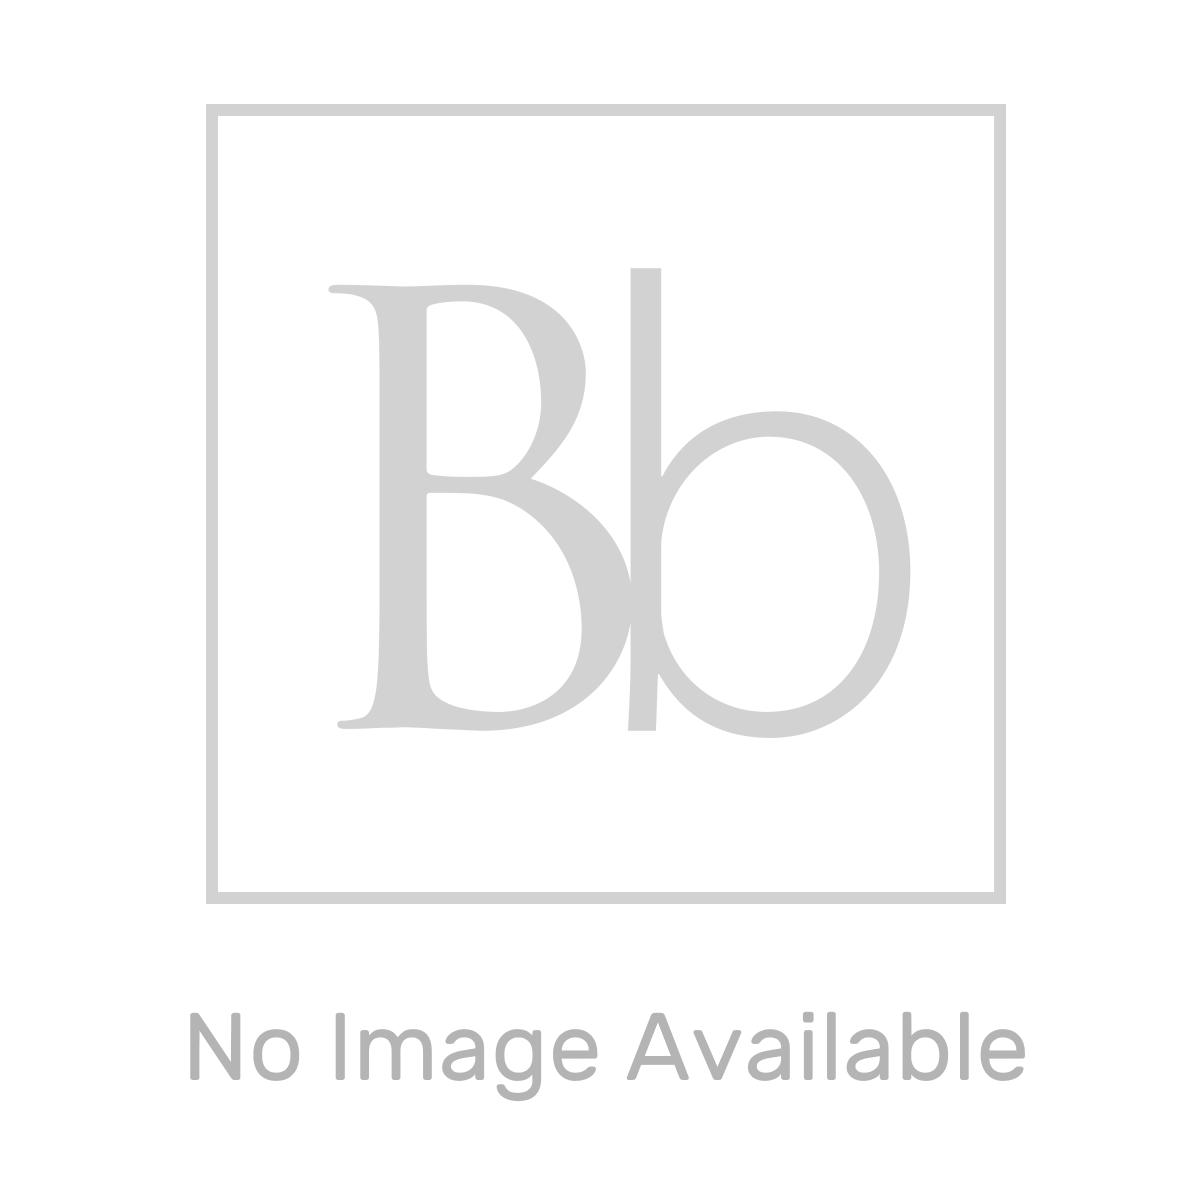 Aquadart White Slate Shower Tray 1500 x 760